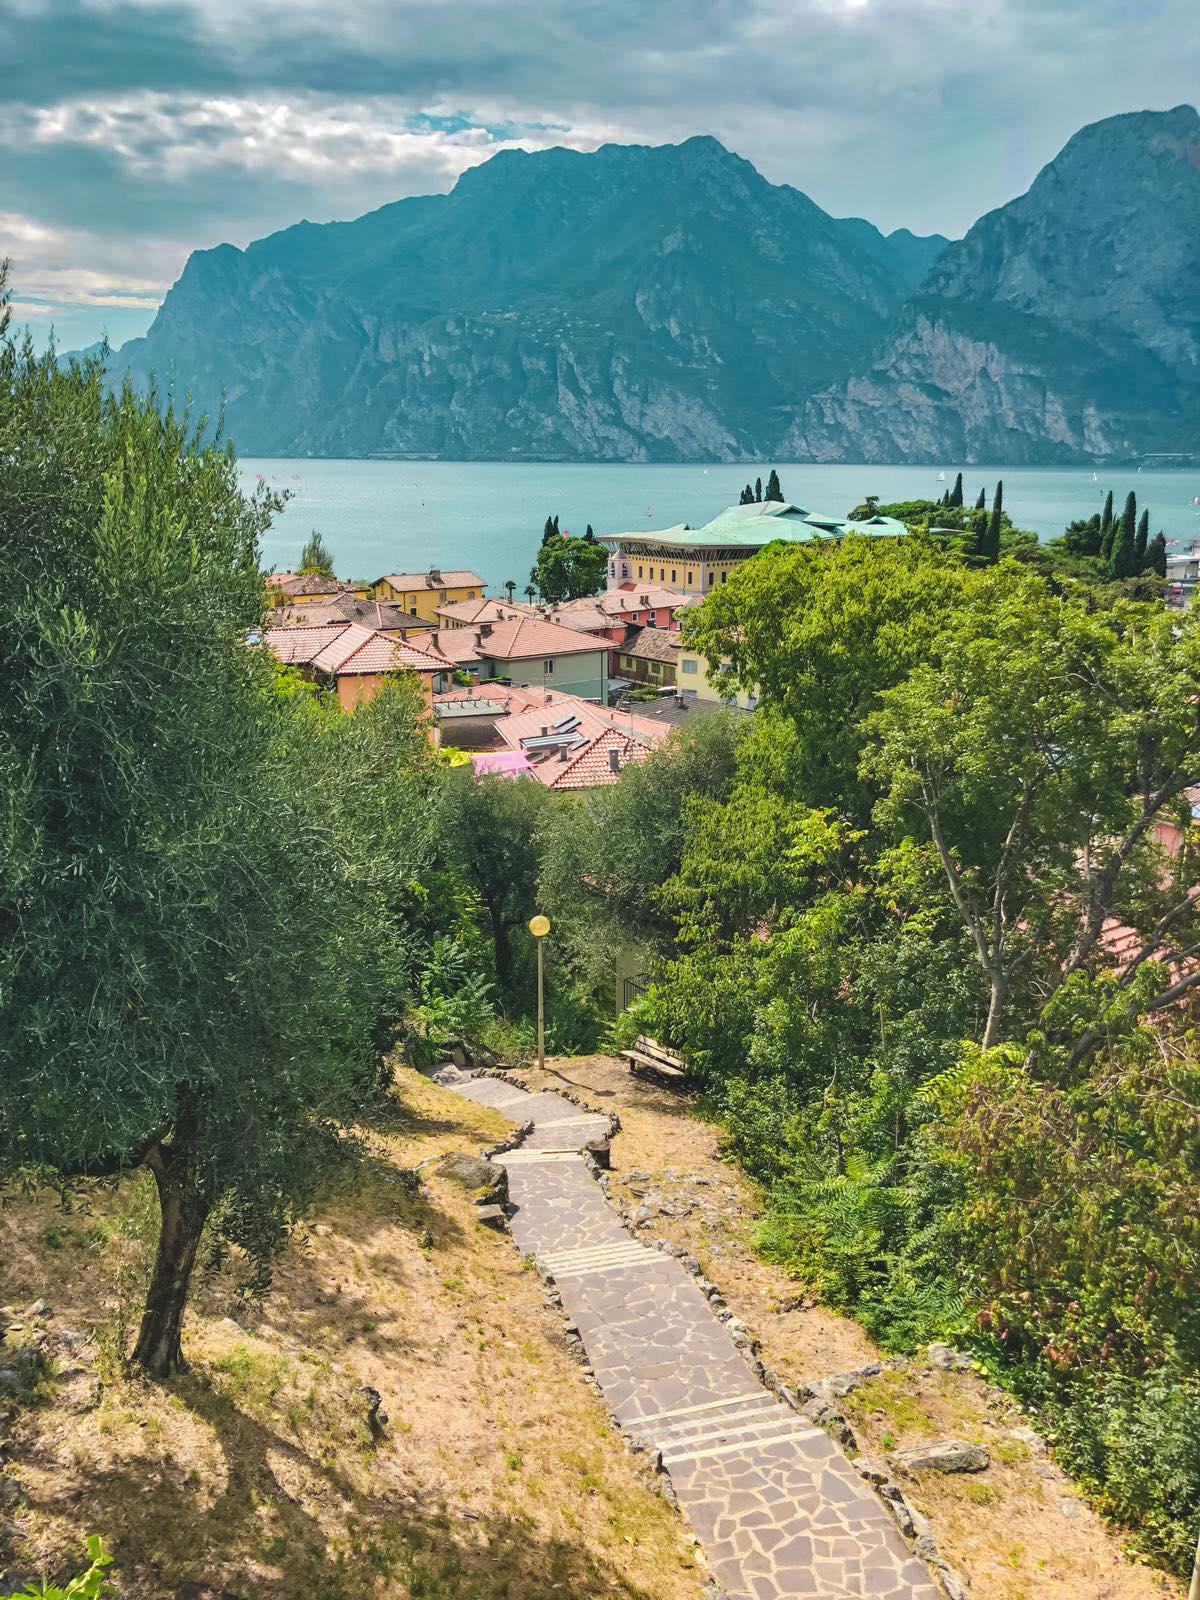 Life On The Road Day 131 Hello from Lago di Garda, ITALY33.jpg